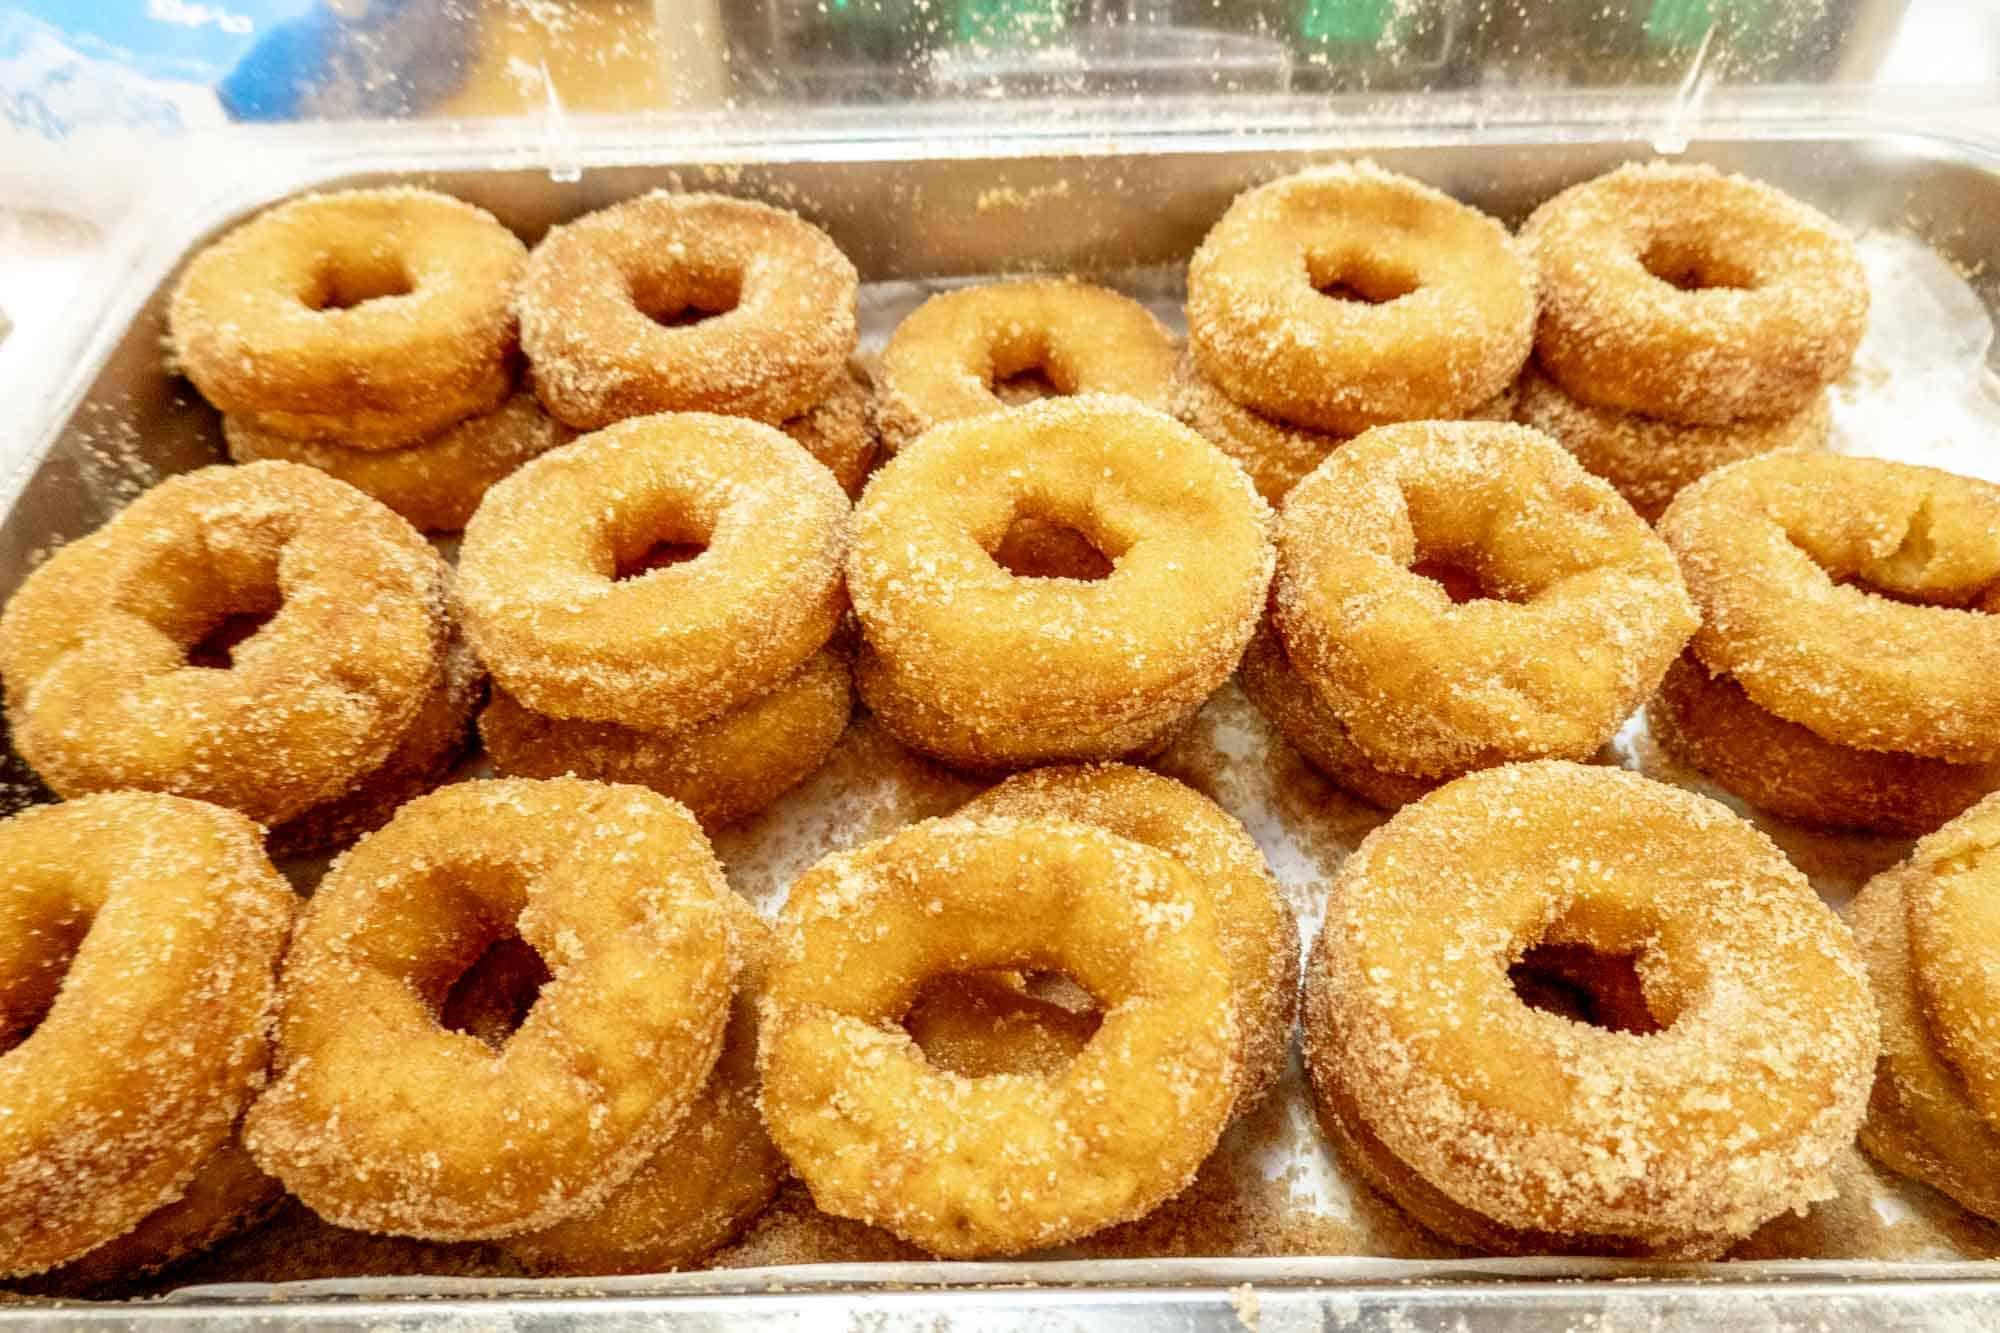 Tray full of dozens of sugar-coated donuts